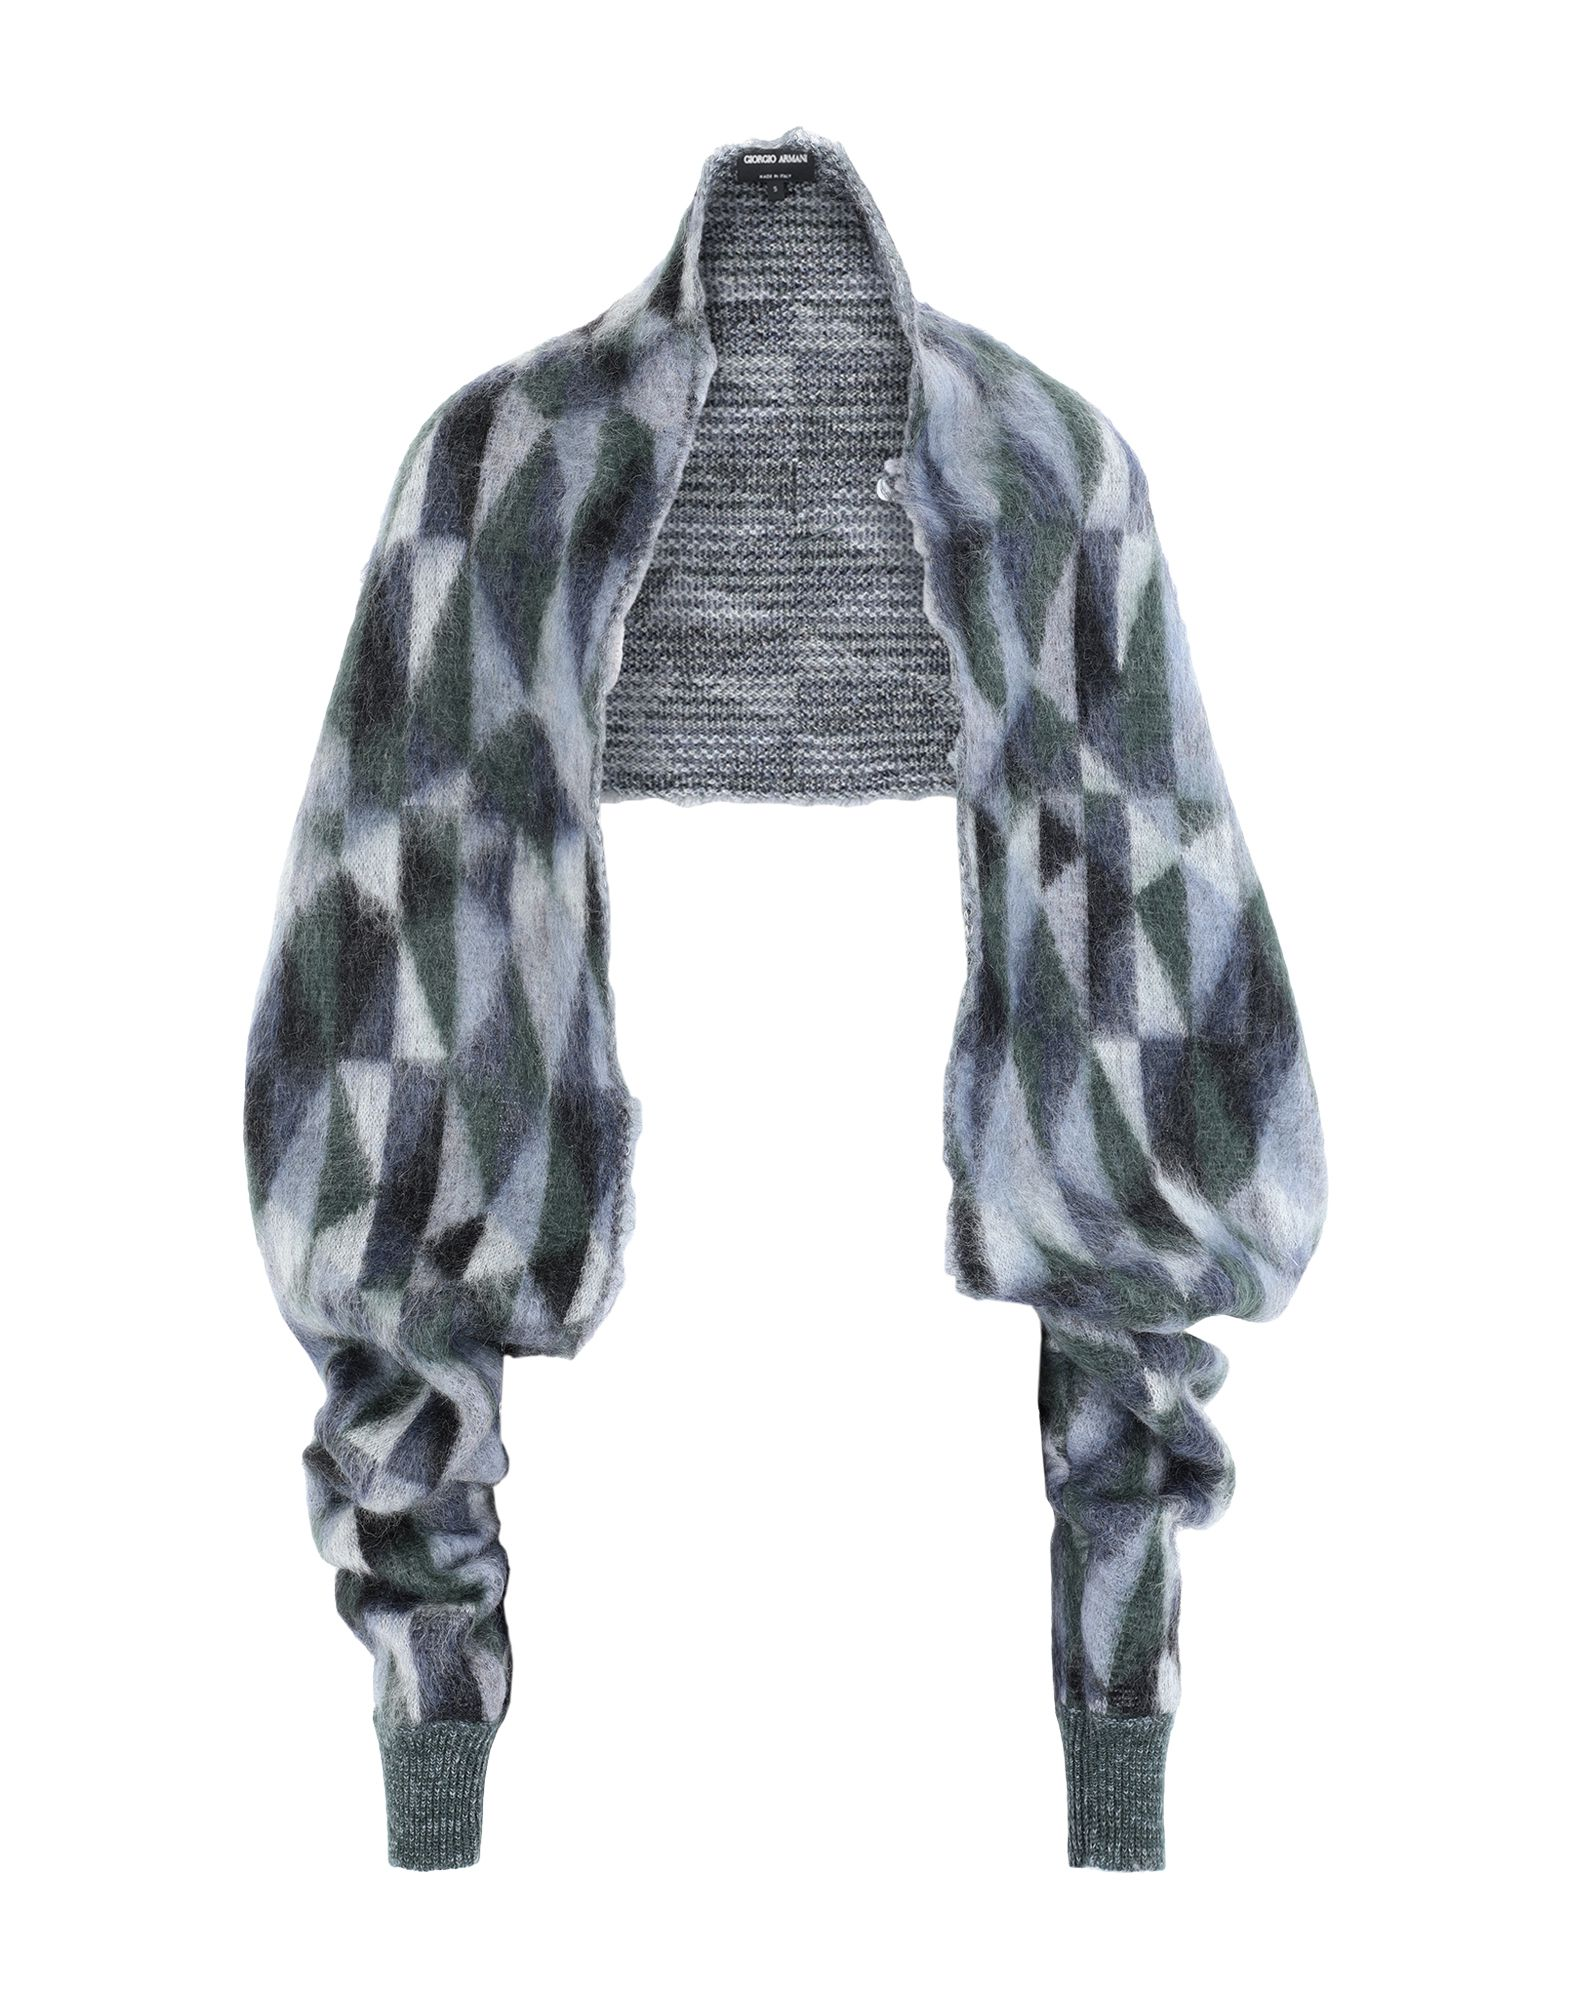 GIORGIO ARMANI Shrugs. knitted, no appliqués, lightweight knit, geometric design, deep neckline, long sleeves, no pockets, small sized. 52% Mohair wool, 34% Polyamide, 7% Wool, 7% Alpaca wool